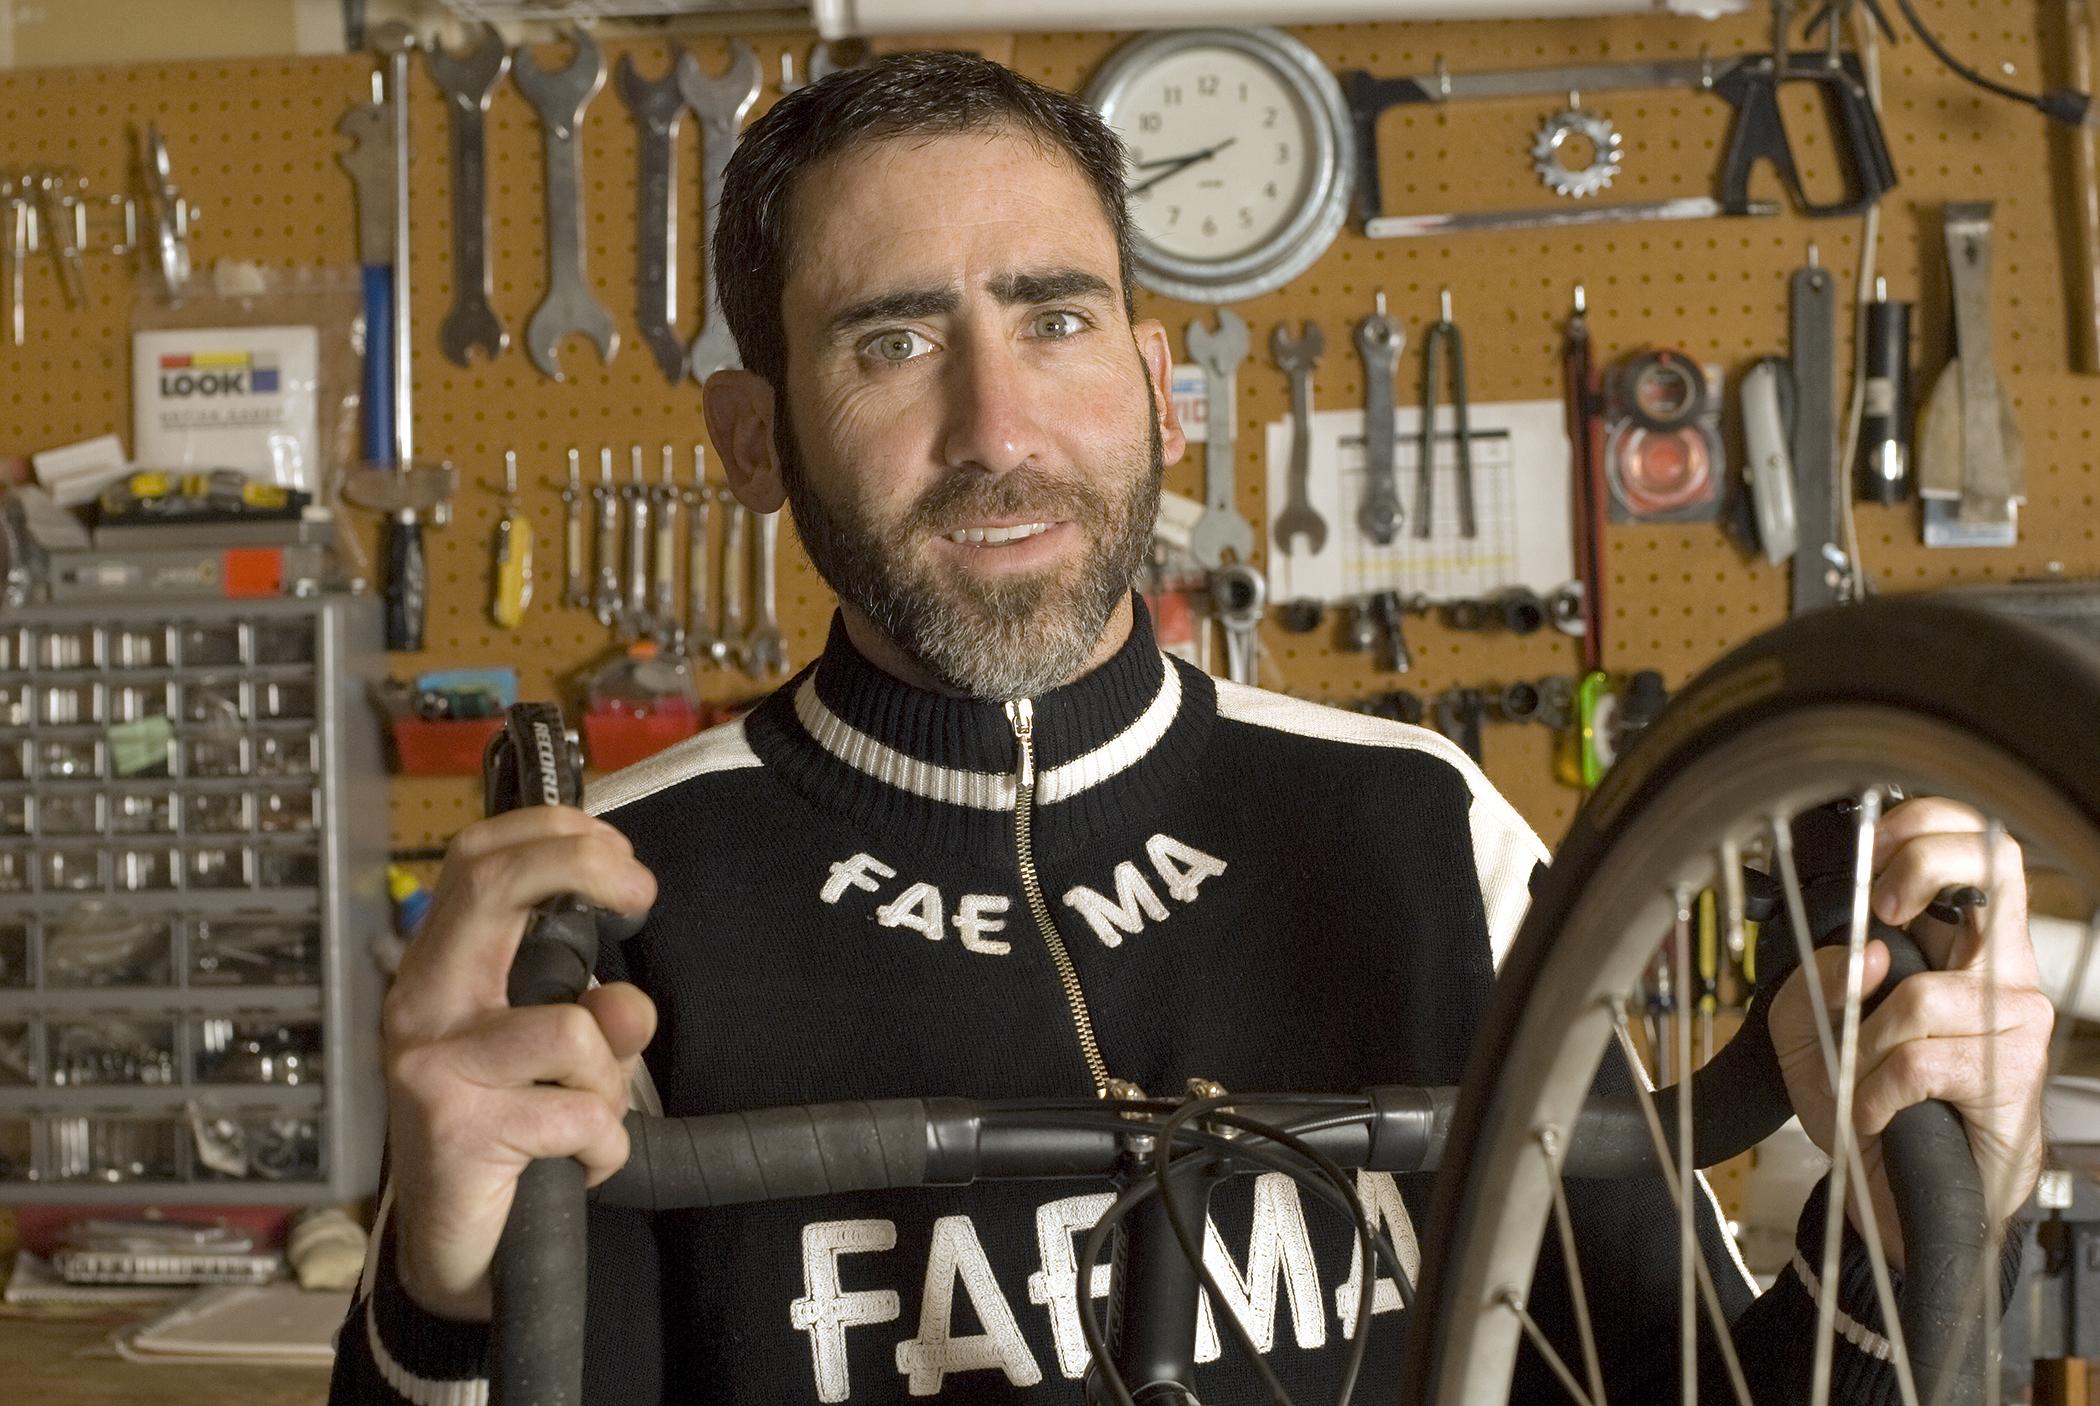 Dave and his Eddy Merckx  Environmental portrait for the My Favorite Bike portrait series.